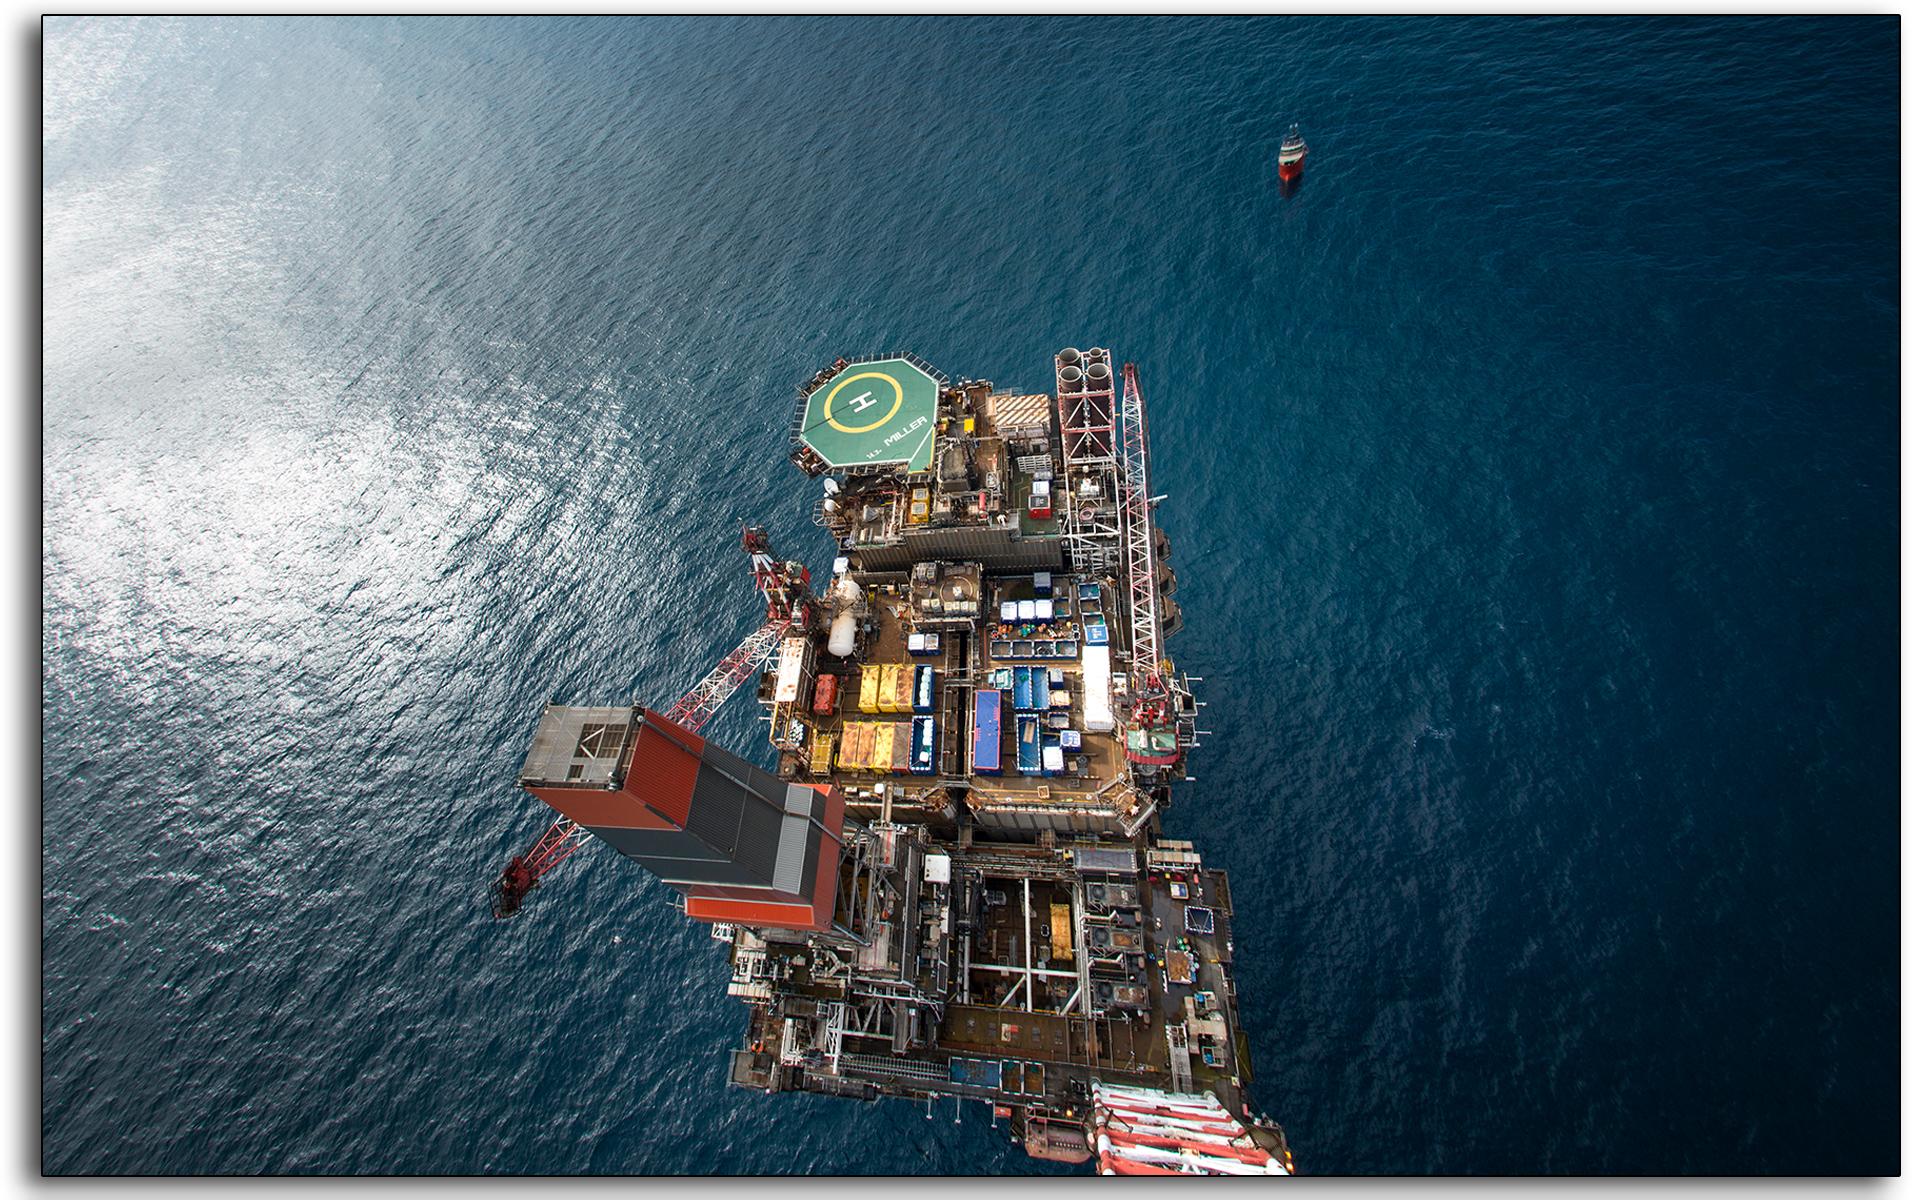 Flare view, heighest point, in the, north sea, 162m, BP Miller, oil, gas, rig, platform, Aberdeen, BP,Petrofac, Saipem, Lee Ramsden industrial photographer.jpg